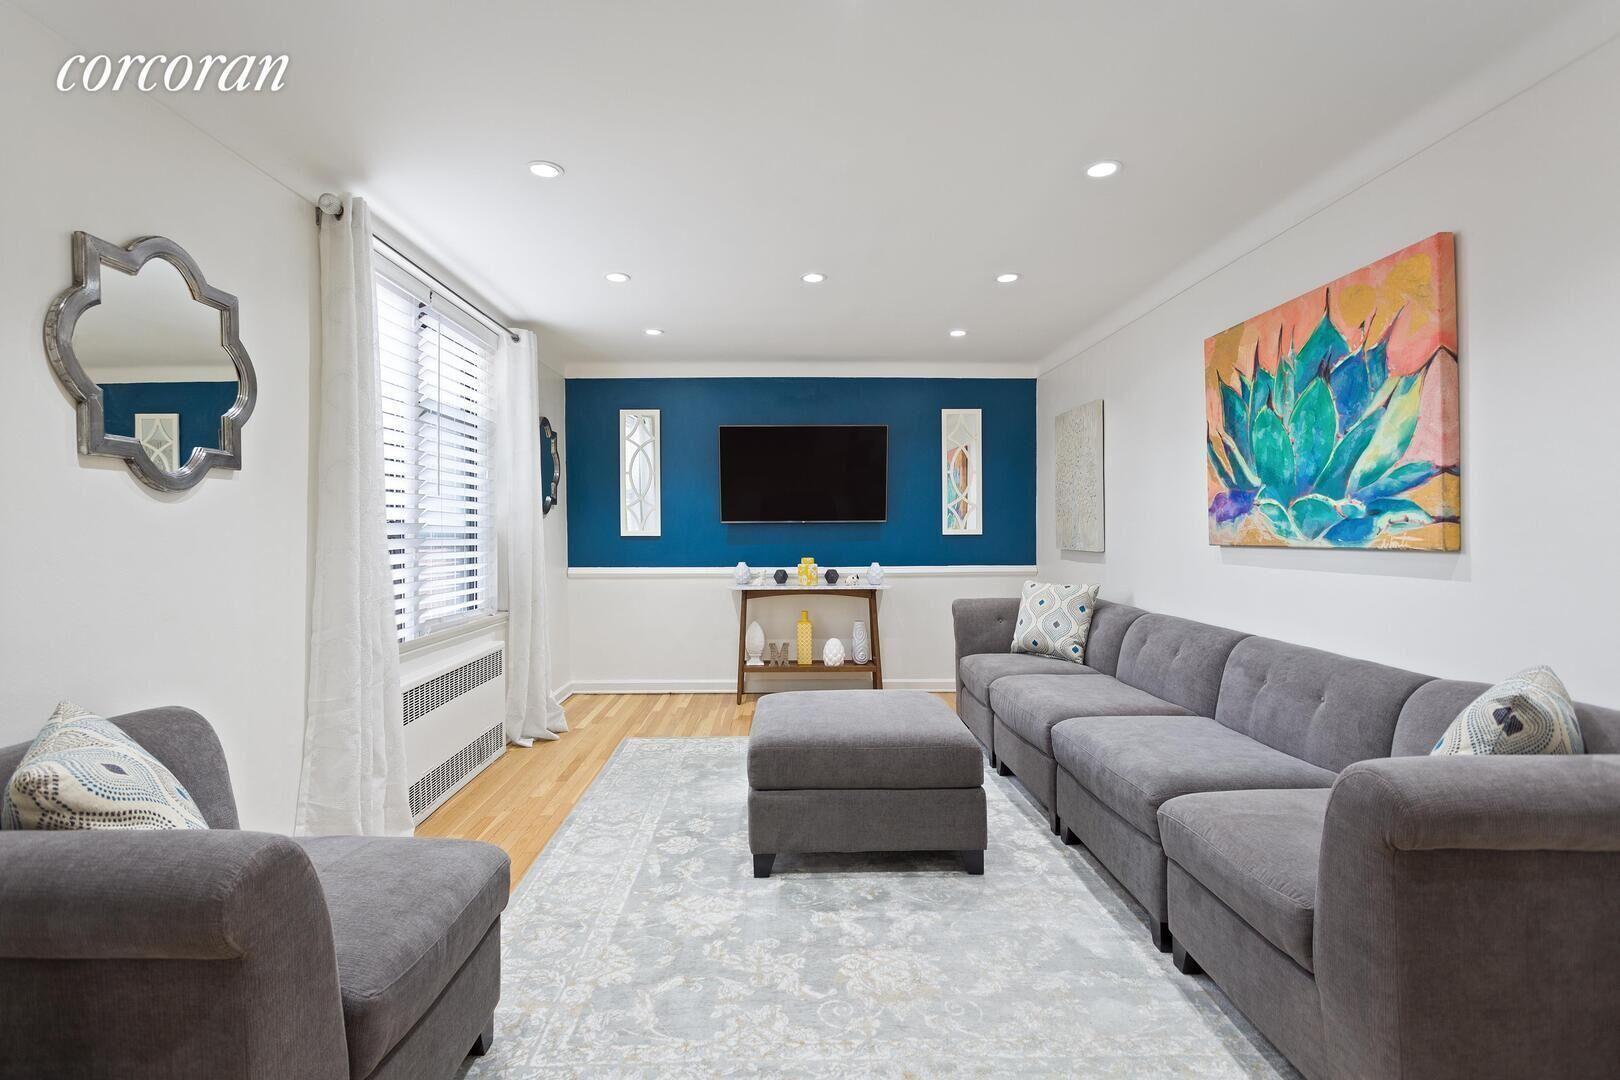 Apartment for sale at 61 Oliver Street, Apt 1j